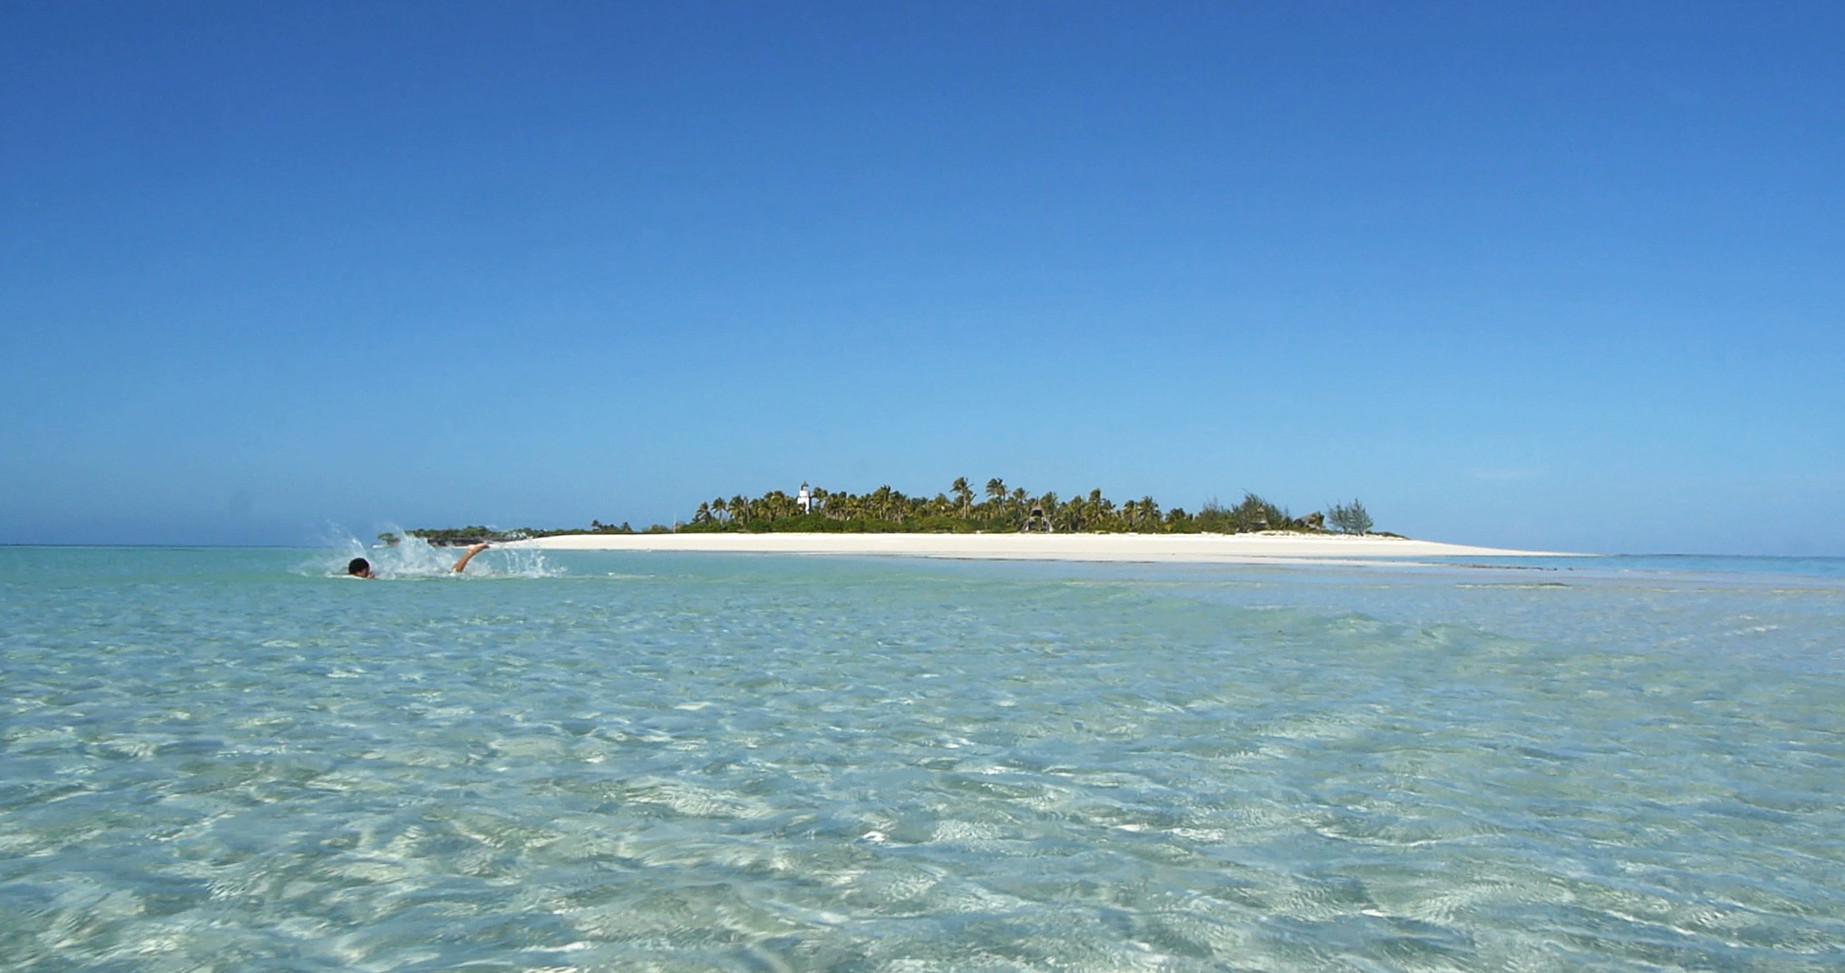 Tanzania Fanjove island with snorkeller